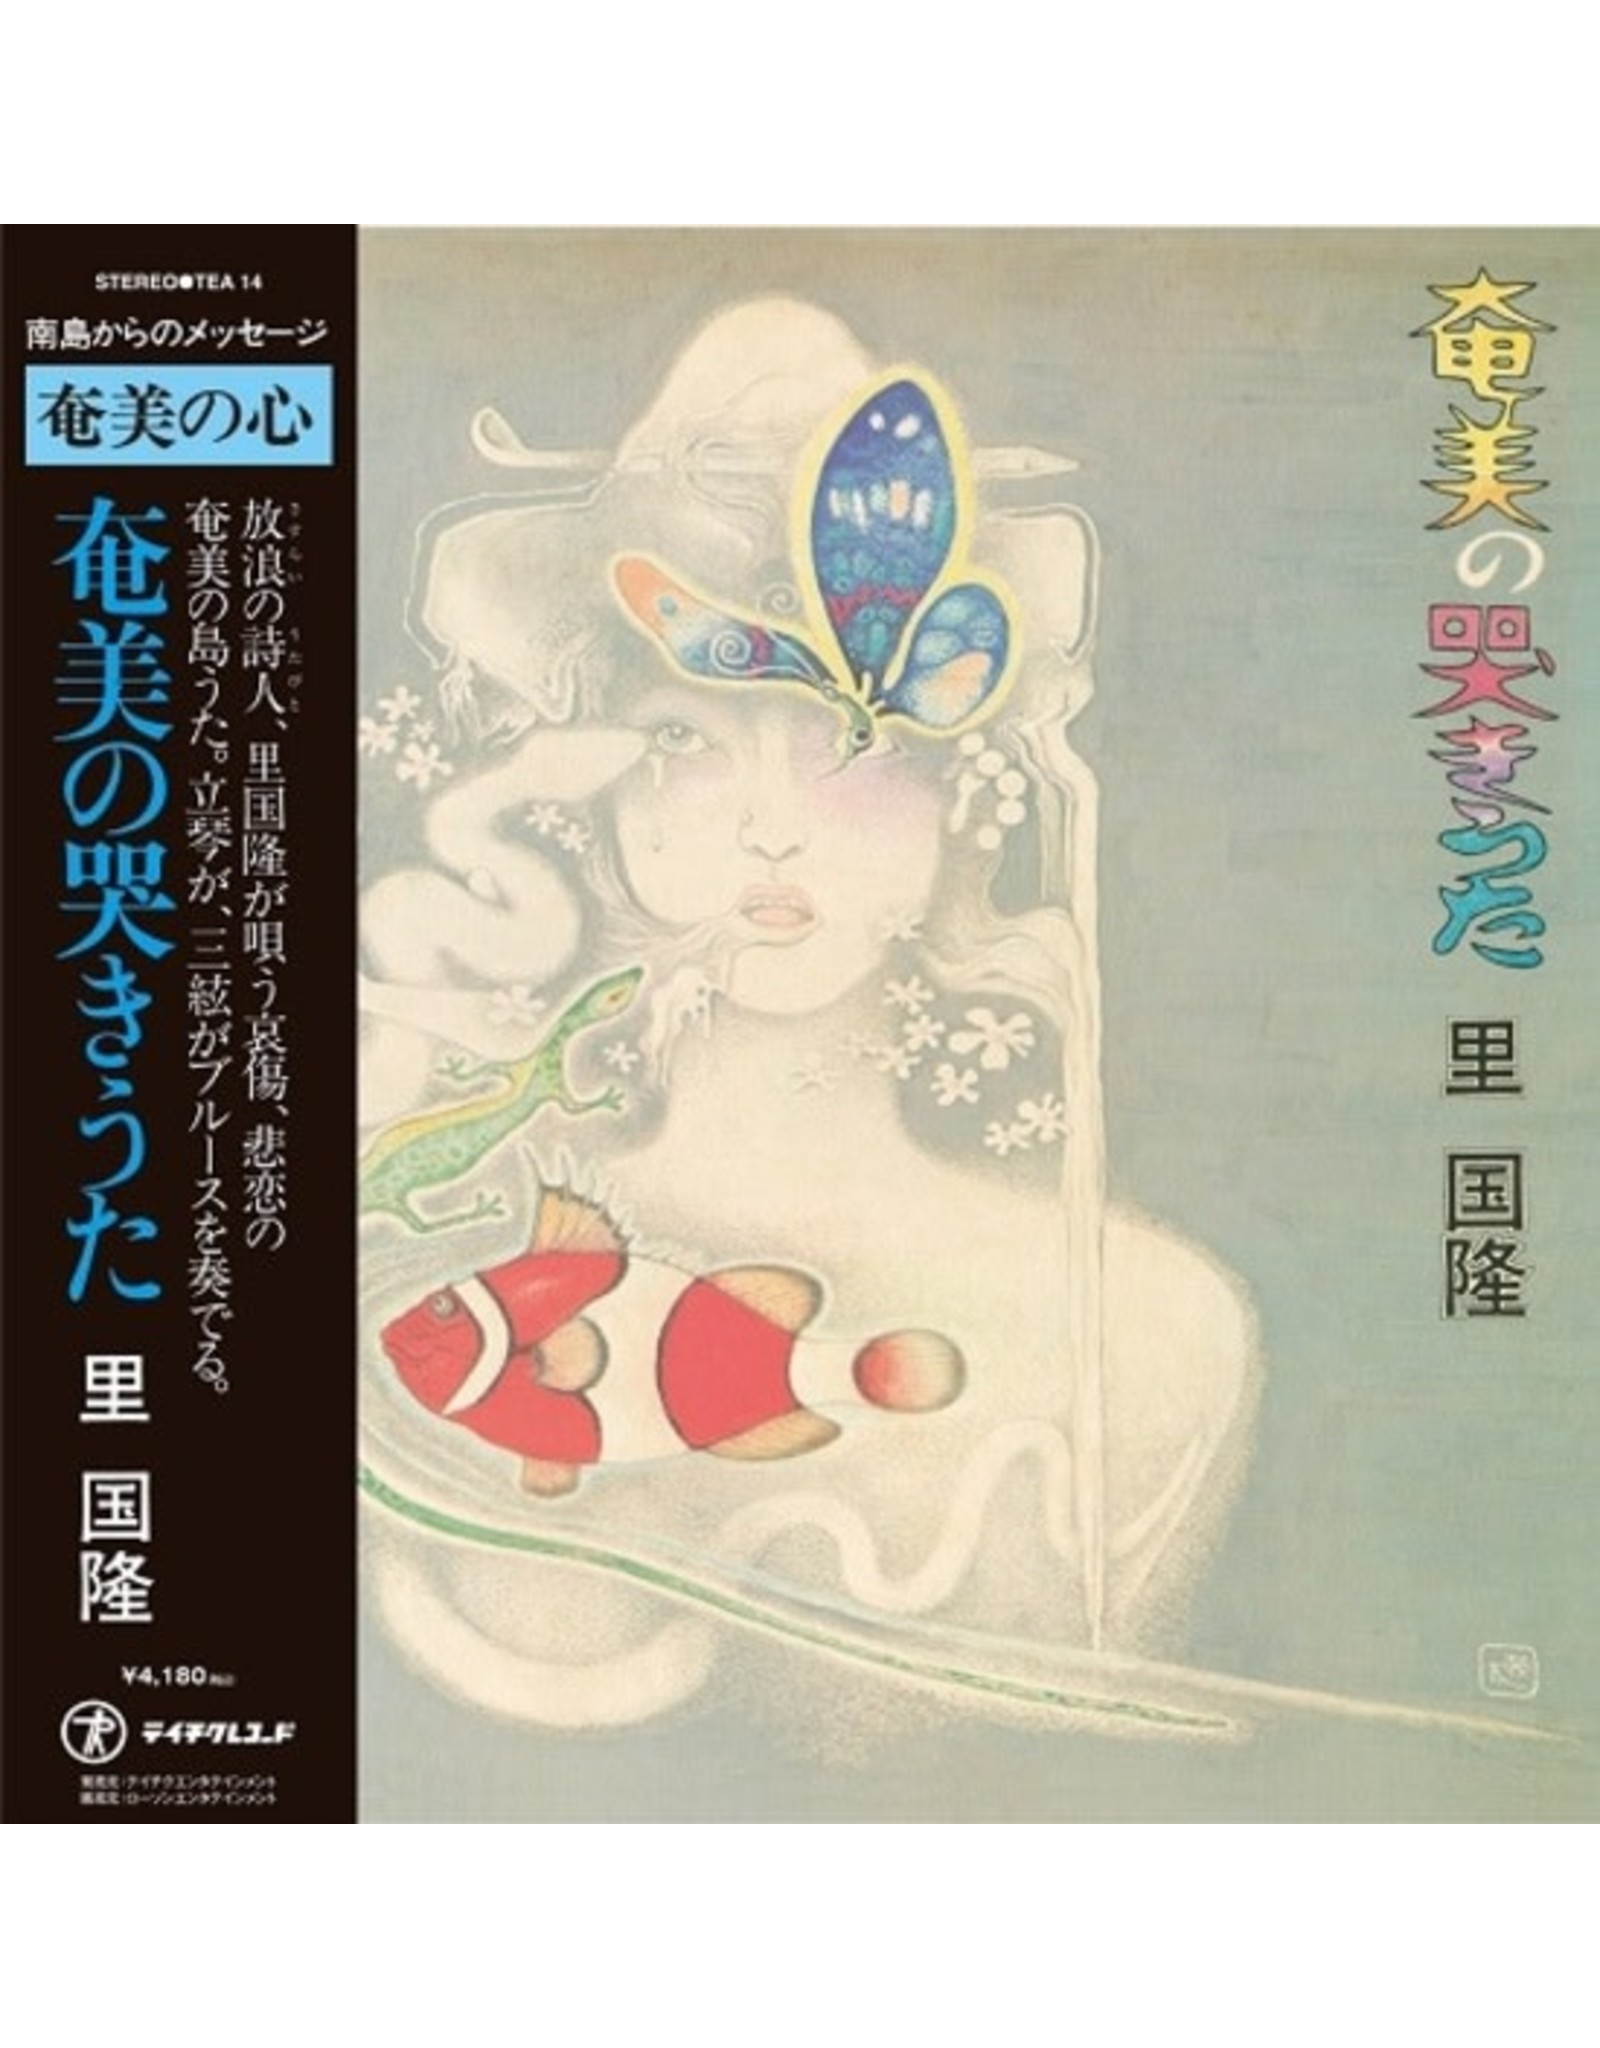 HMV Sato, Kunitaka: Amami's Roaring Song LP